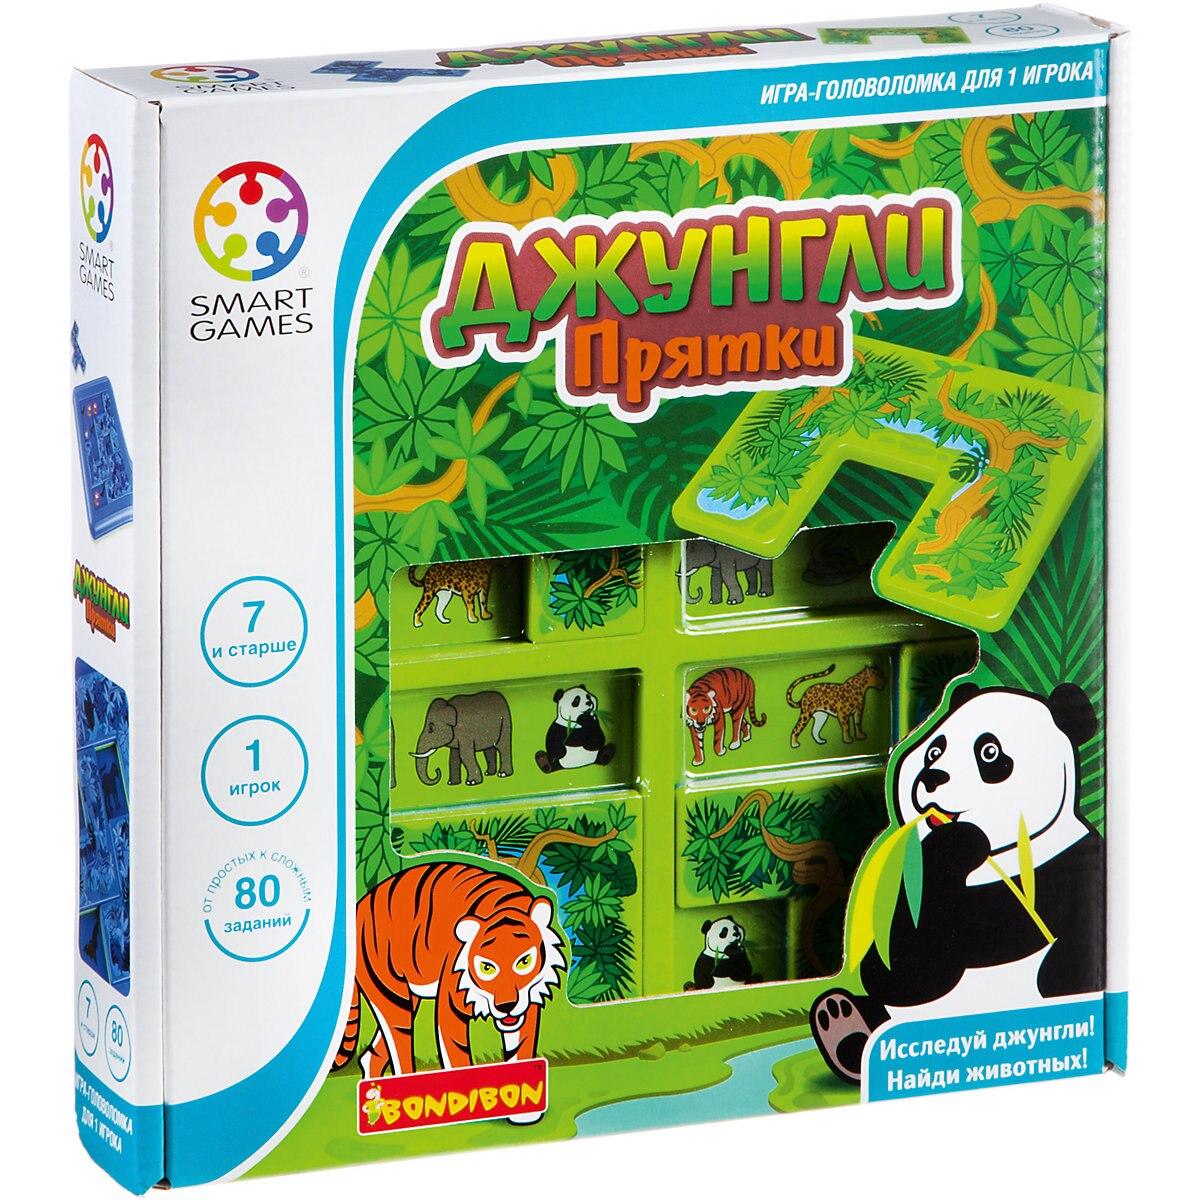 BONDIBON Party Games 7420001 educational toys puzzle game  toy puzzle toy educational toy panda shape magic cube